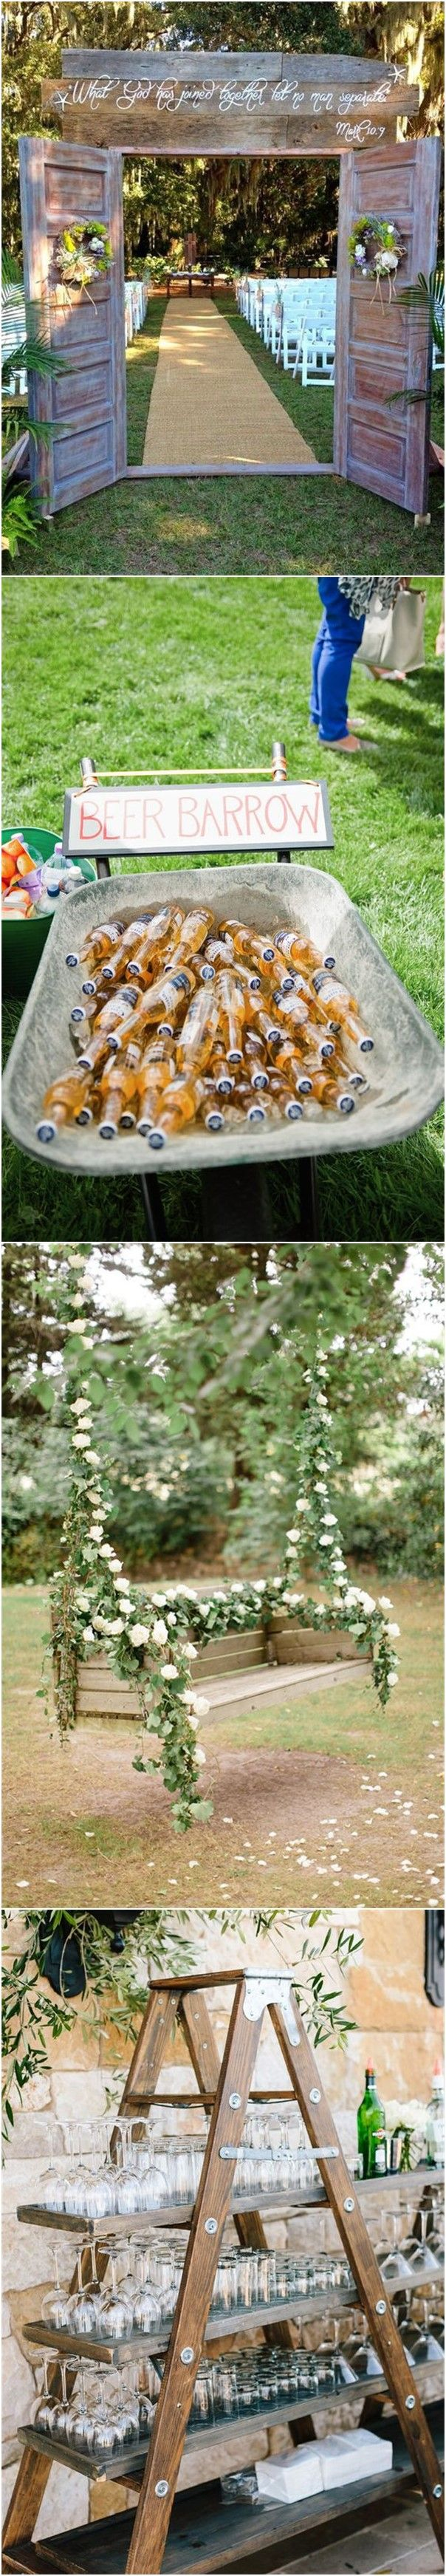 Best 25 rustic backyard ideas on pinterest picnic for Backyard wedding decoration ideas on a budget